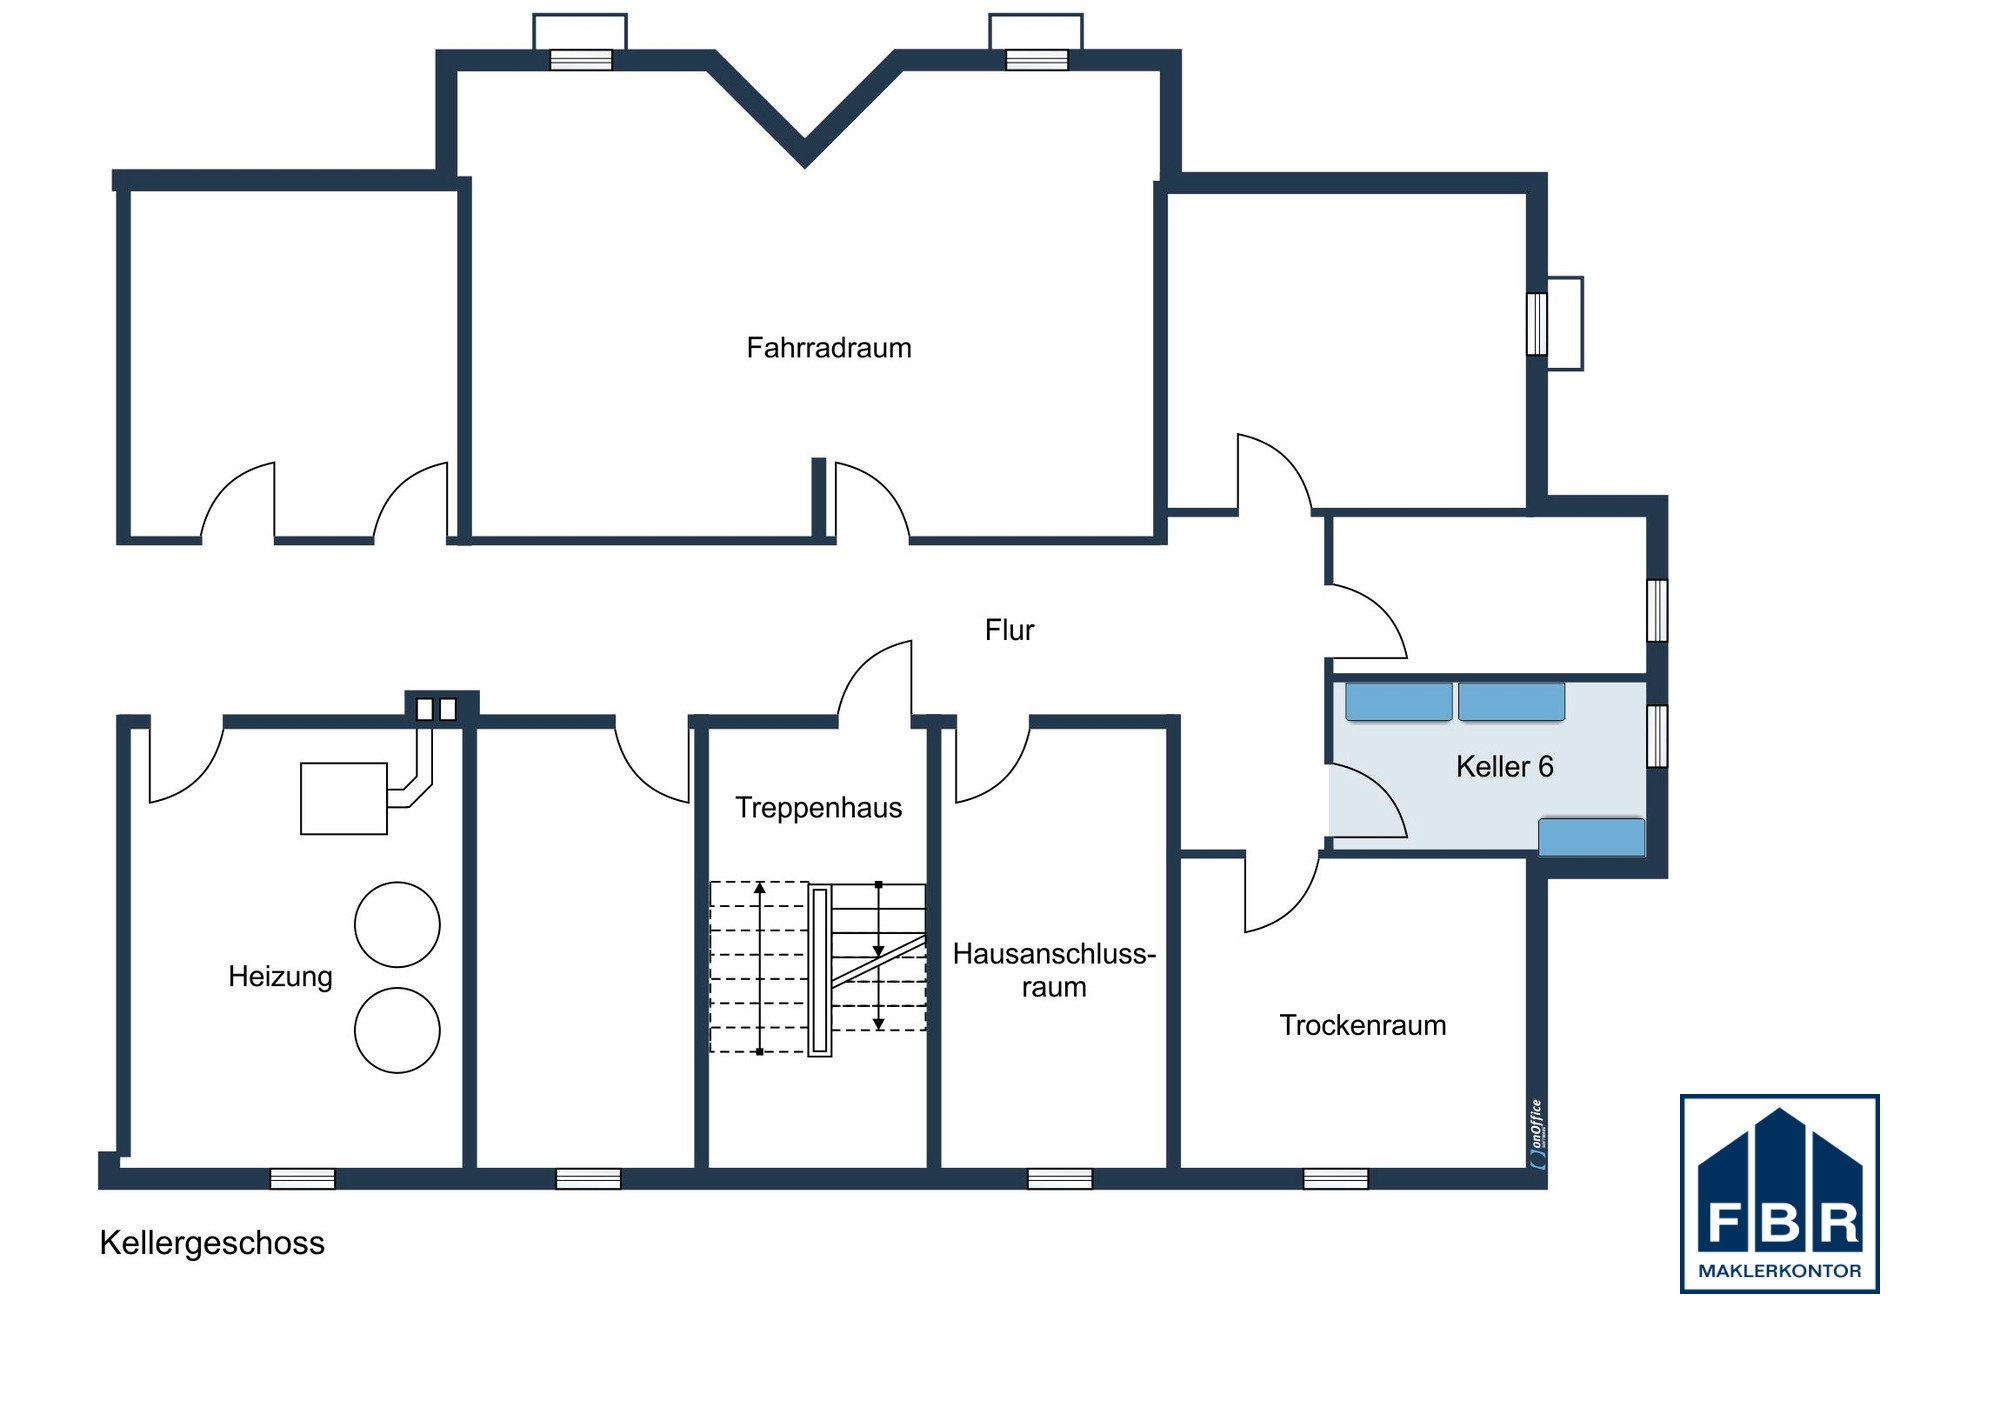 Grundrisszeichnung Kellergeschoss